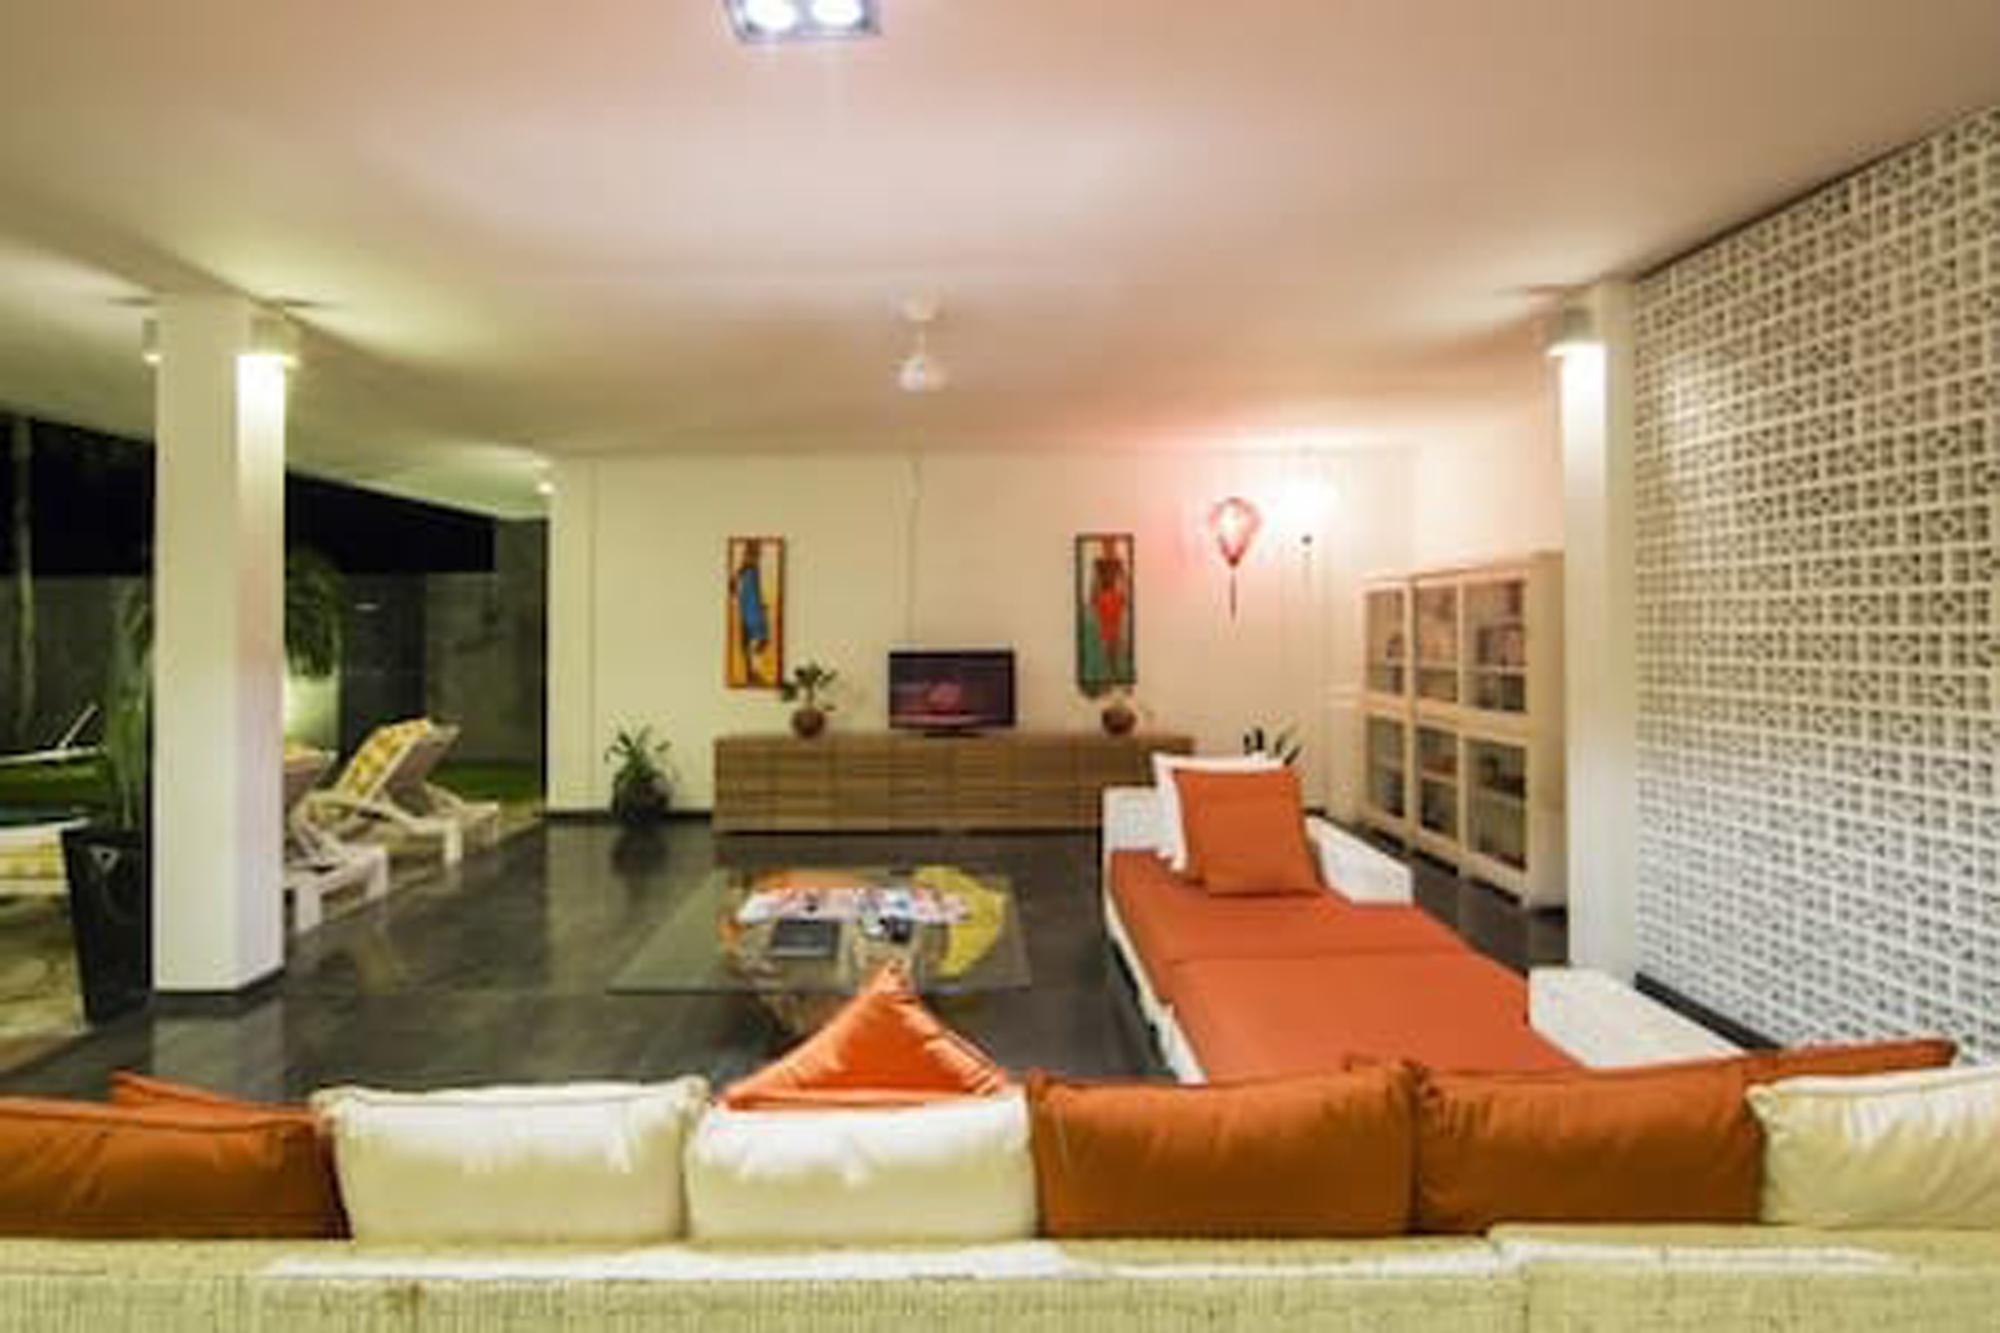 2 BR Hideaways Villa, Canggu, 3min to Eco Beach 2